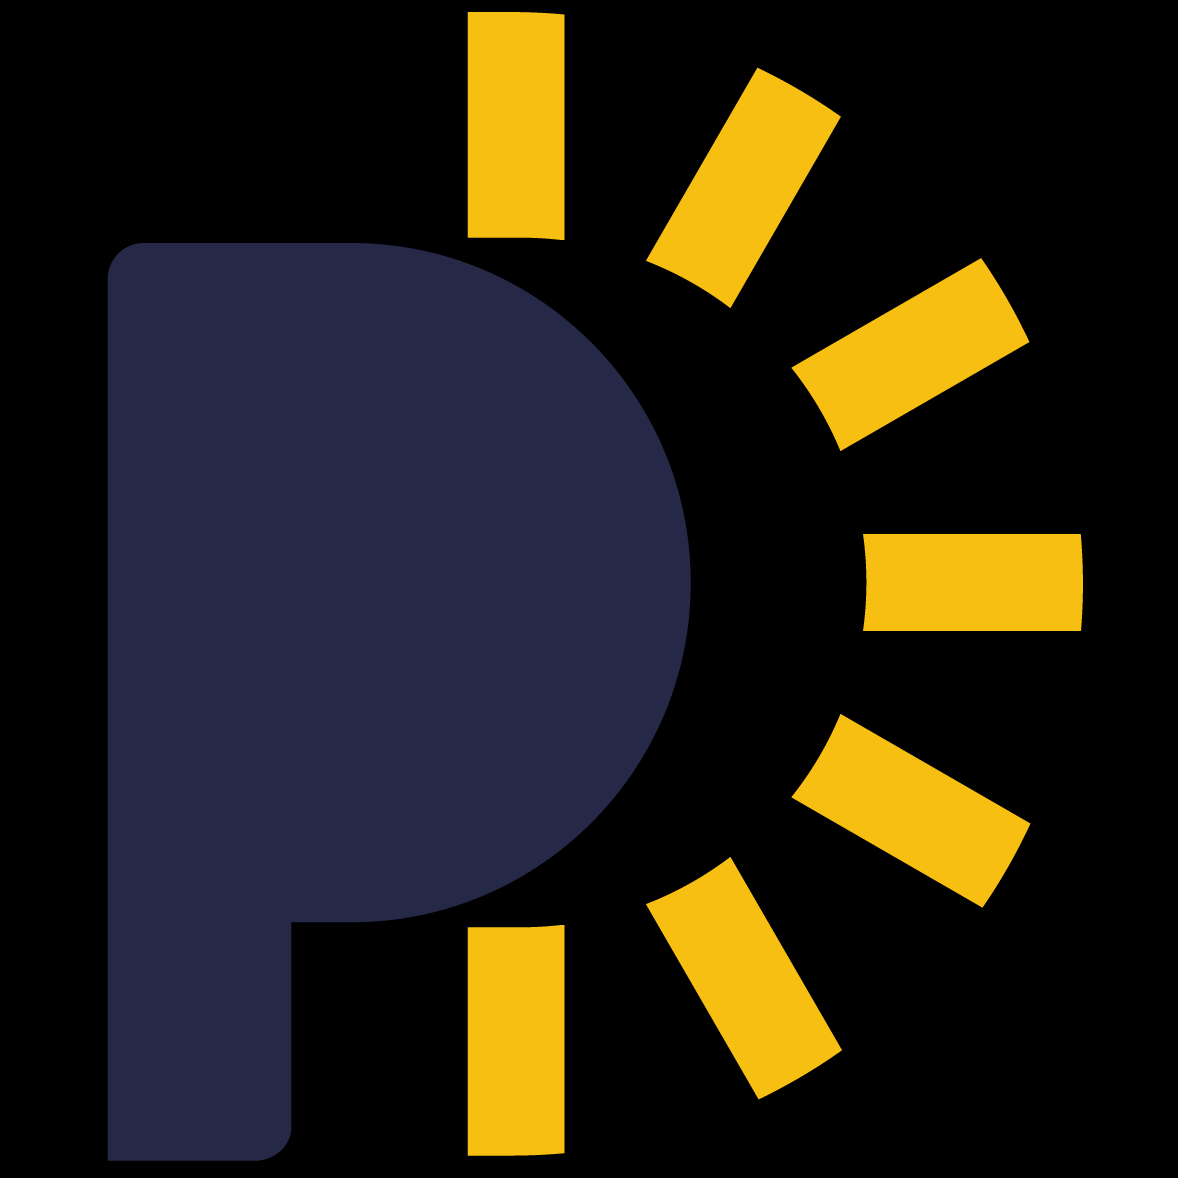 Project Phil - Non-Profit Organization Aiding Children in the Philippines